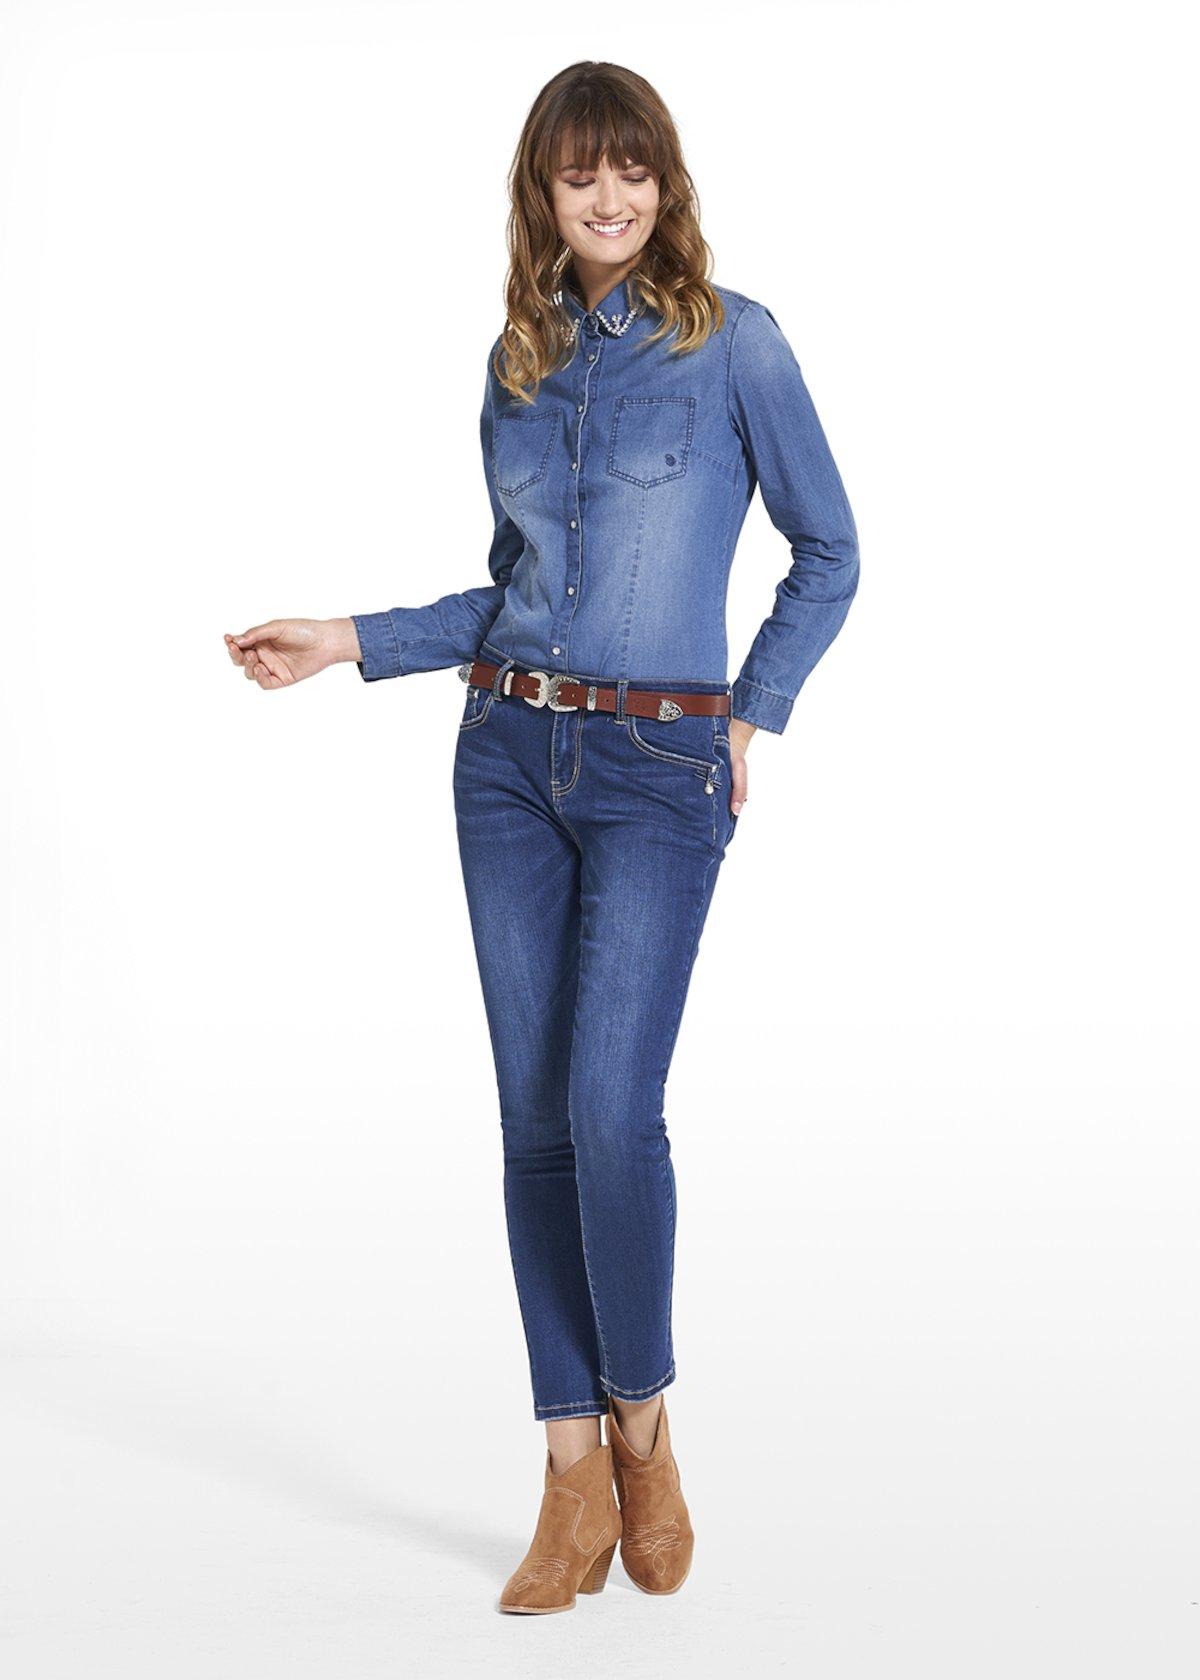 5-pocket skinny leg pants with a grosgrain ribbon detail - Dark Denim - Woman - Category image